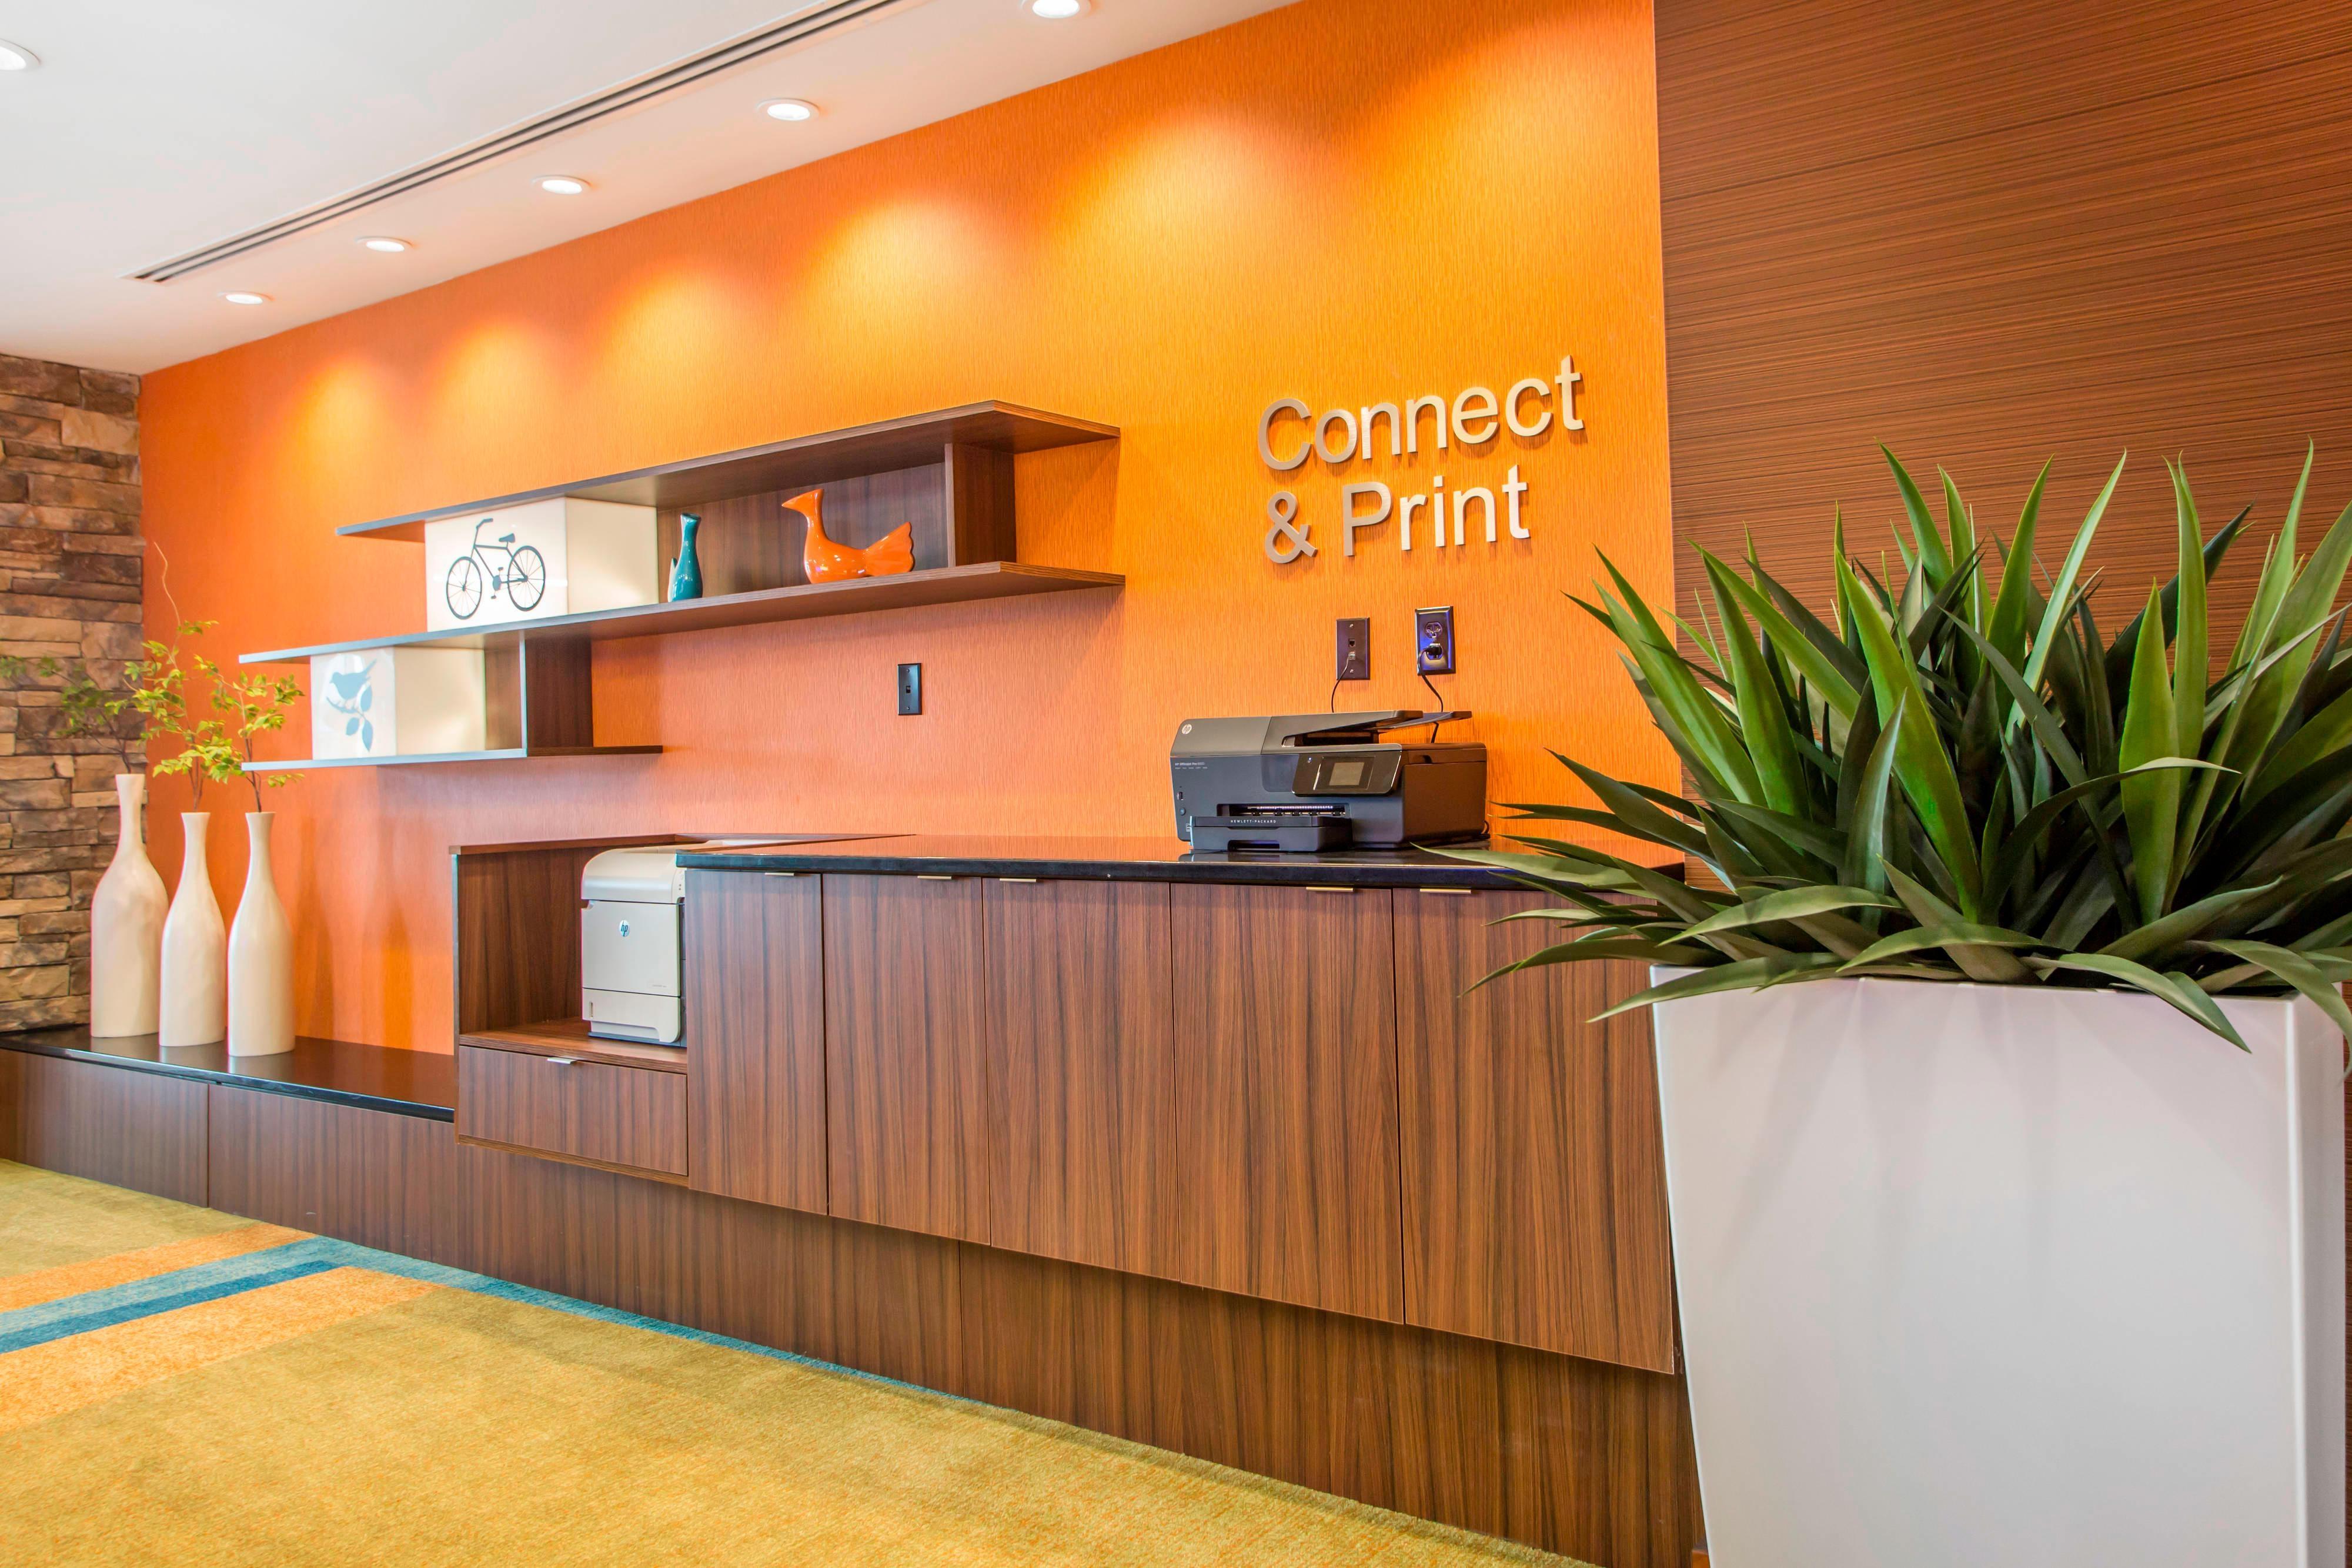 Fairfield Inn & Suites Business Center